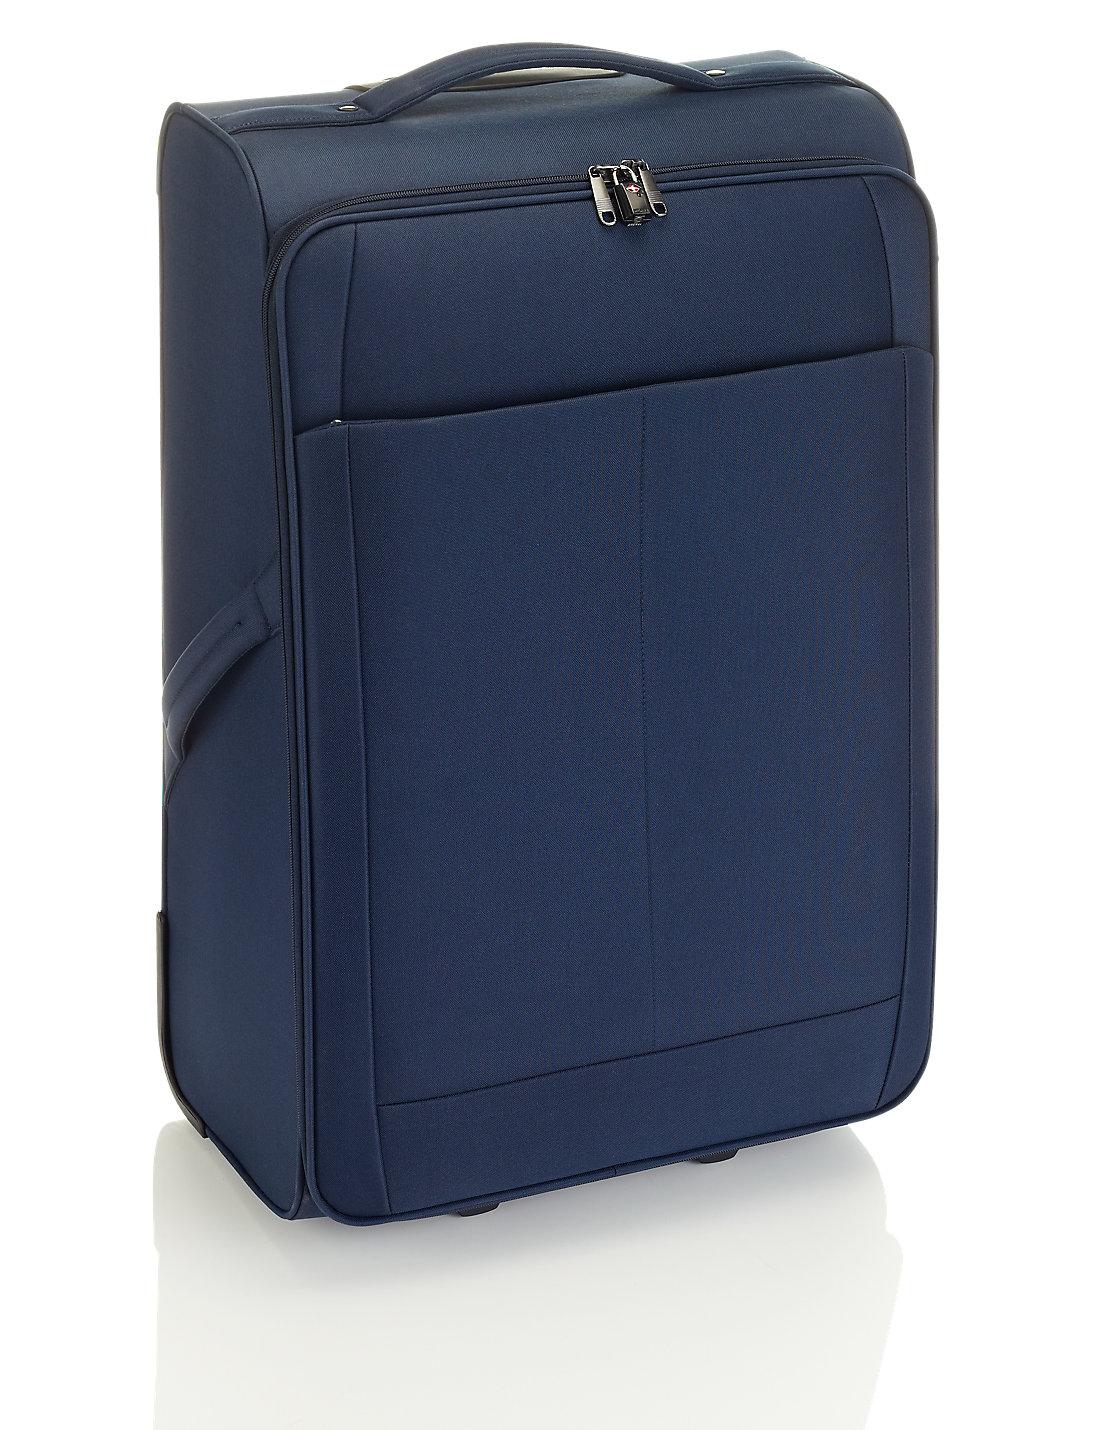 2 Wheel Large Suitcase | M&S